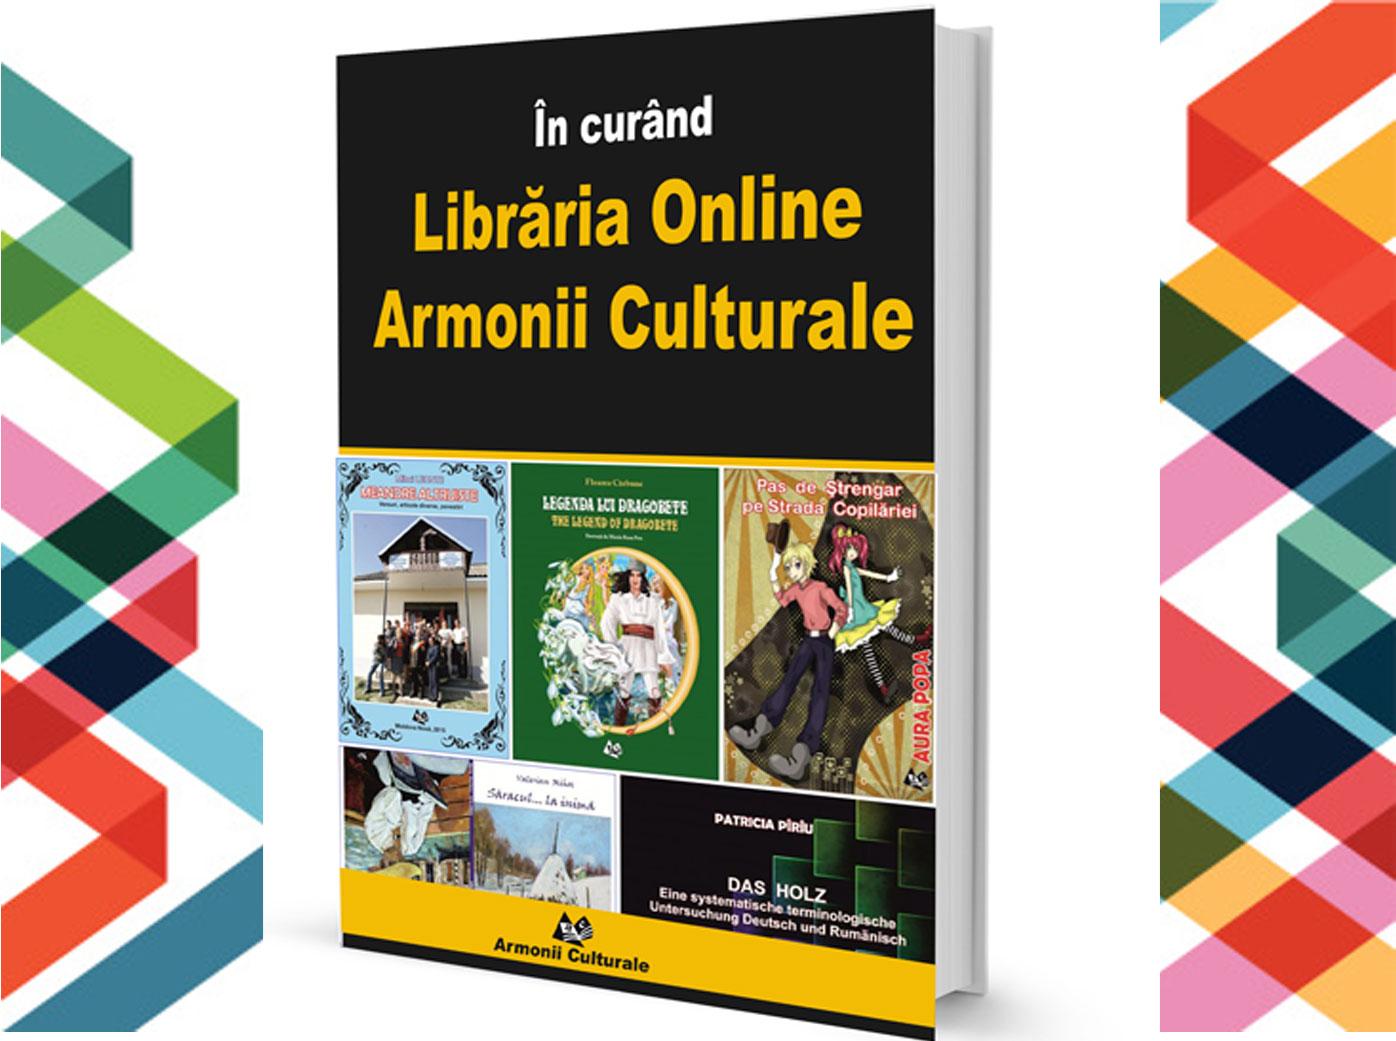 In curand Libraria Armonii Culturale